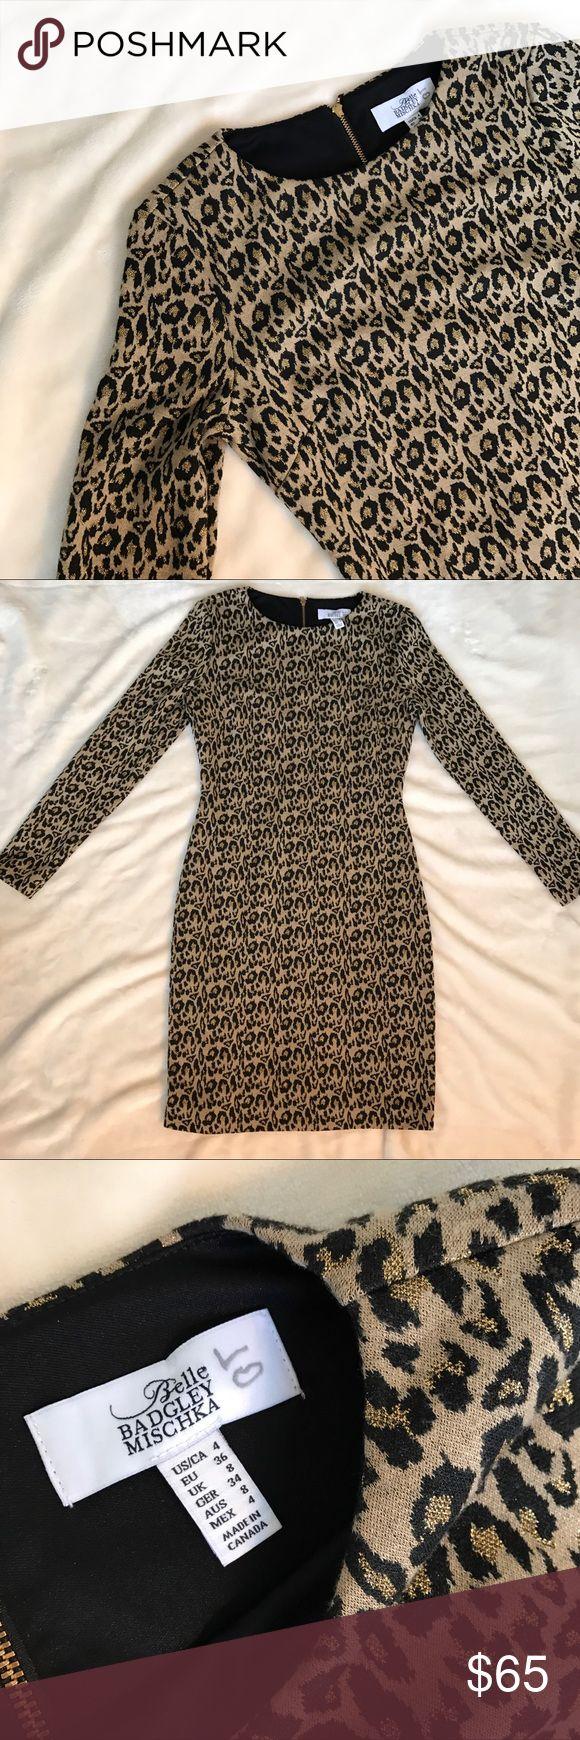 Bagdley Mishka animal print dress Animal print long sleeve dress with gold zipper detailing in back. Badgley Mischka Dresses Long Sleeve